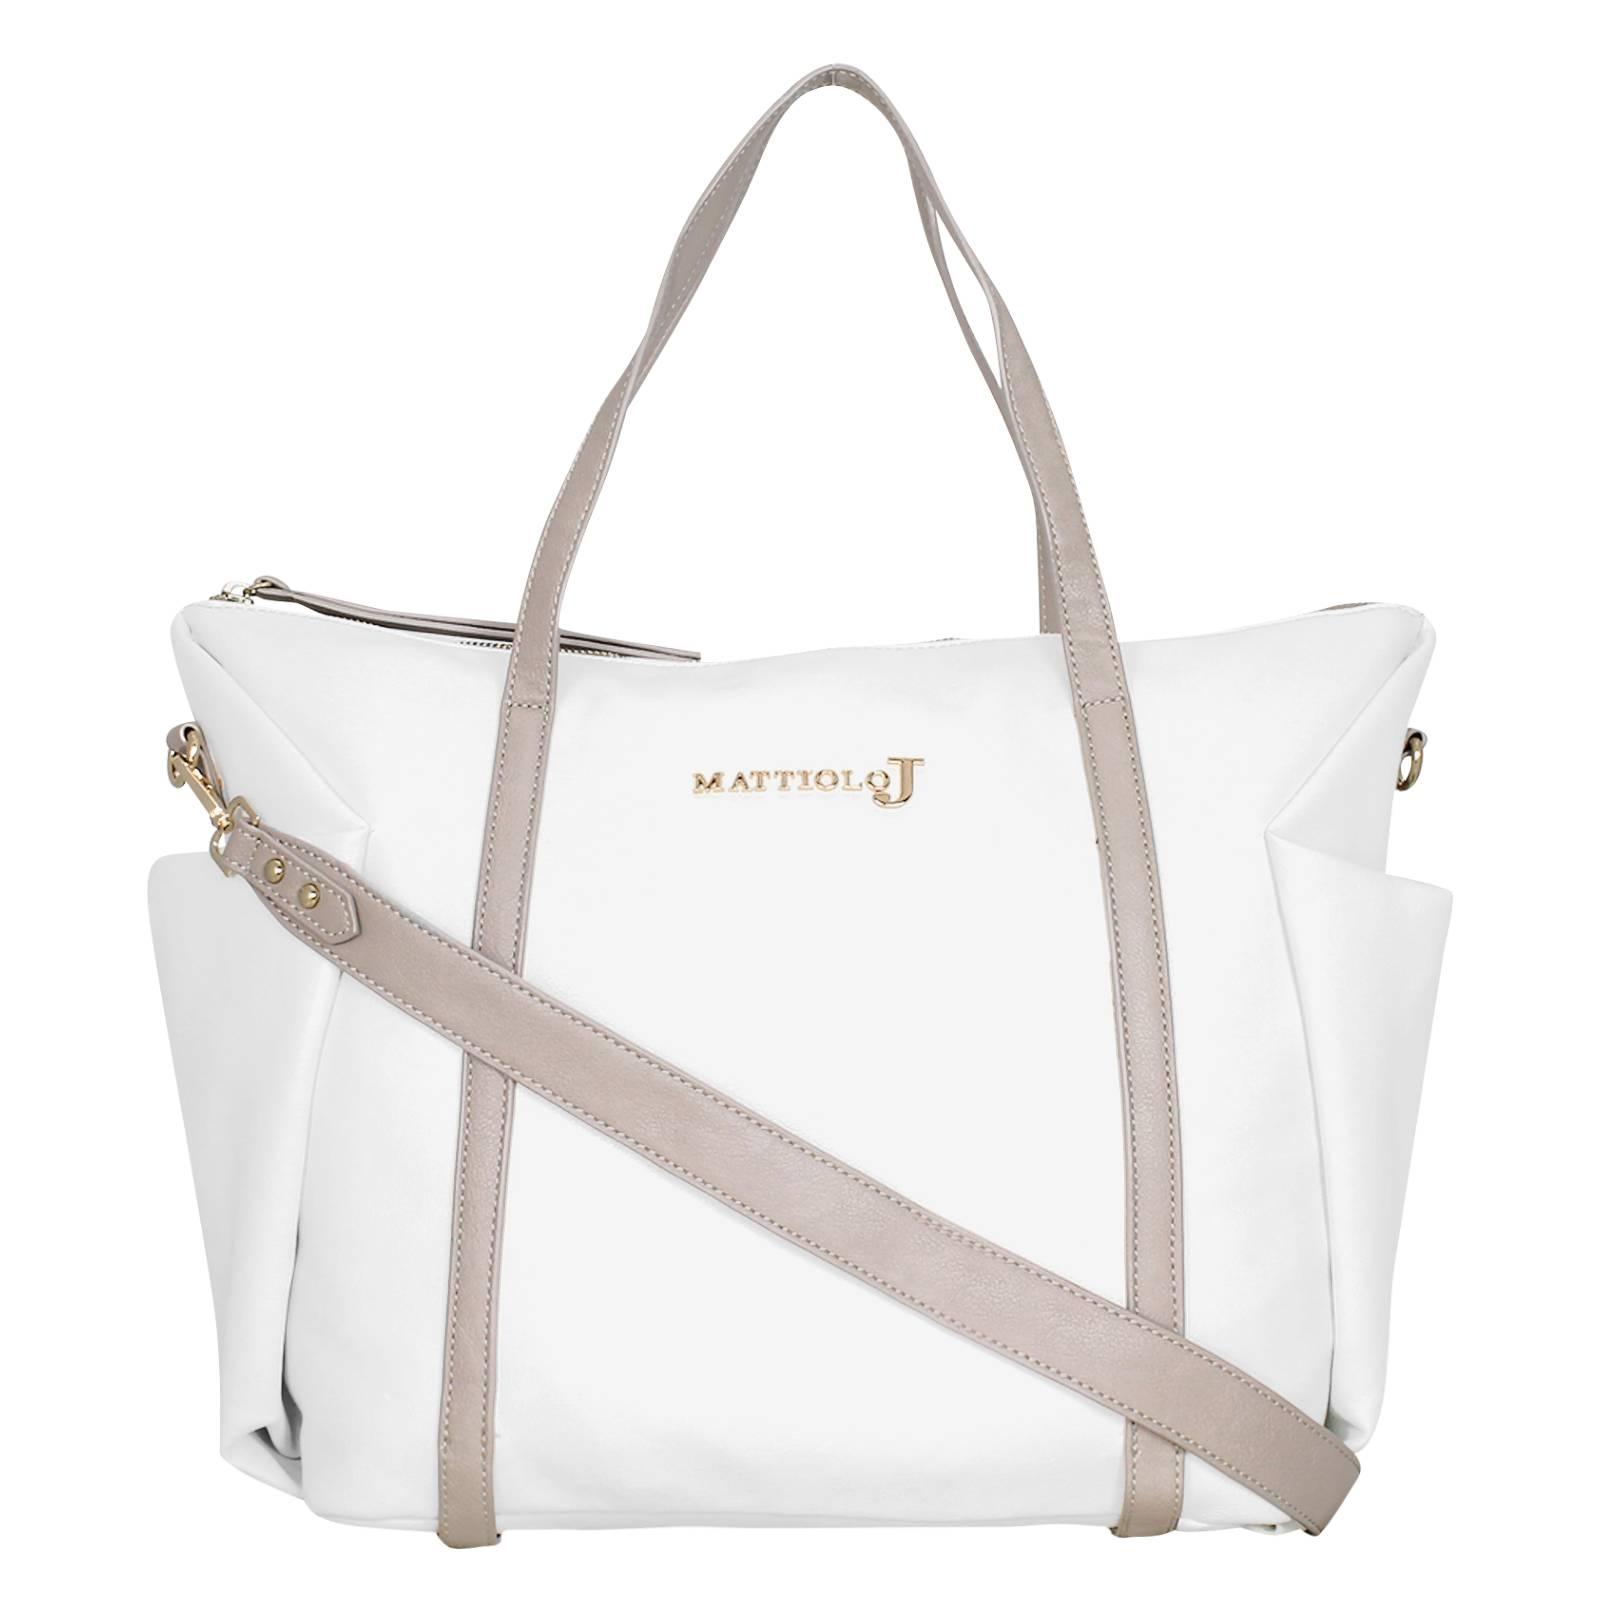 new product ed491 7c6ab Mattiolo J Thabeban bag